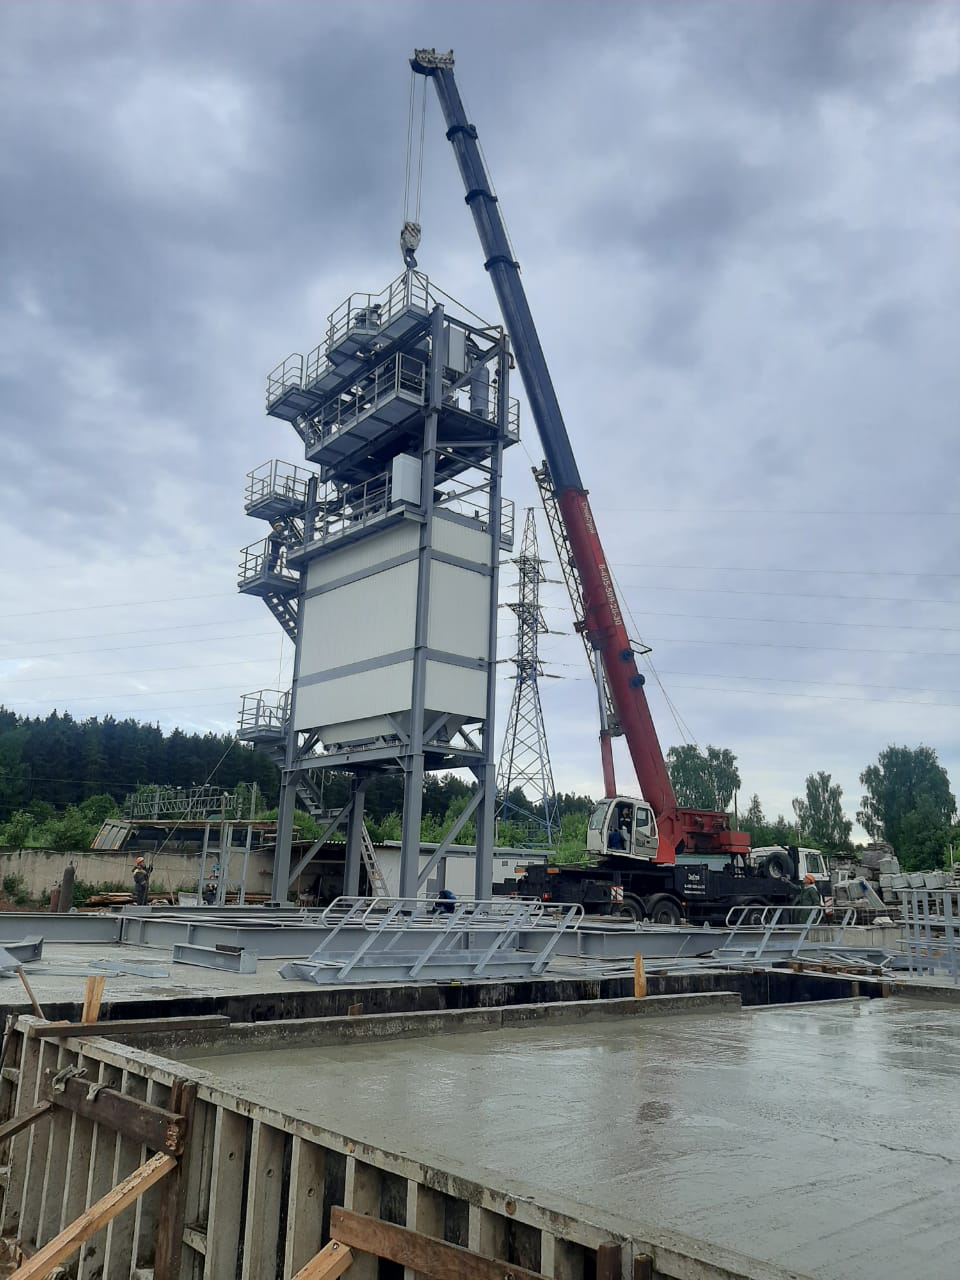 Аренда манипулятора 10 тонн в Москве